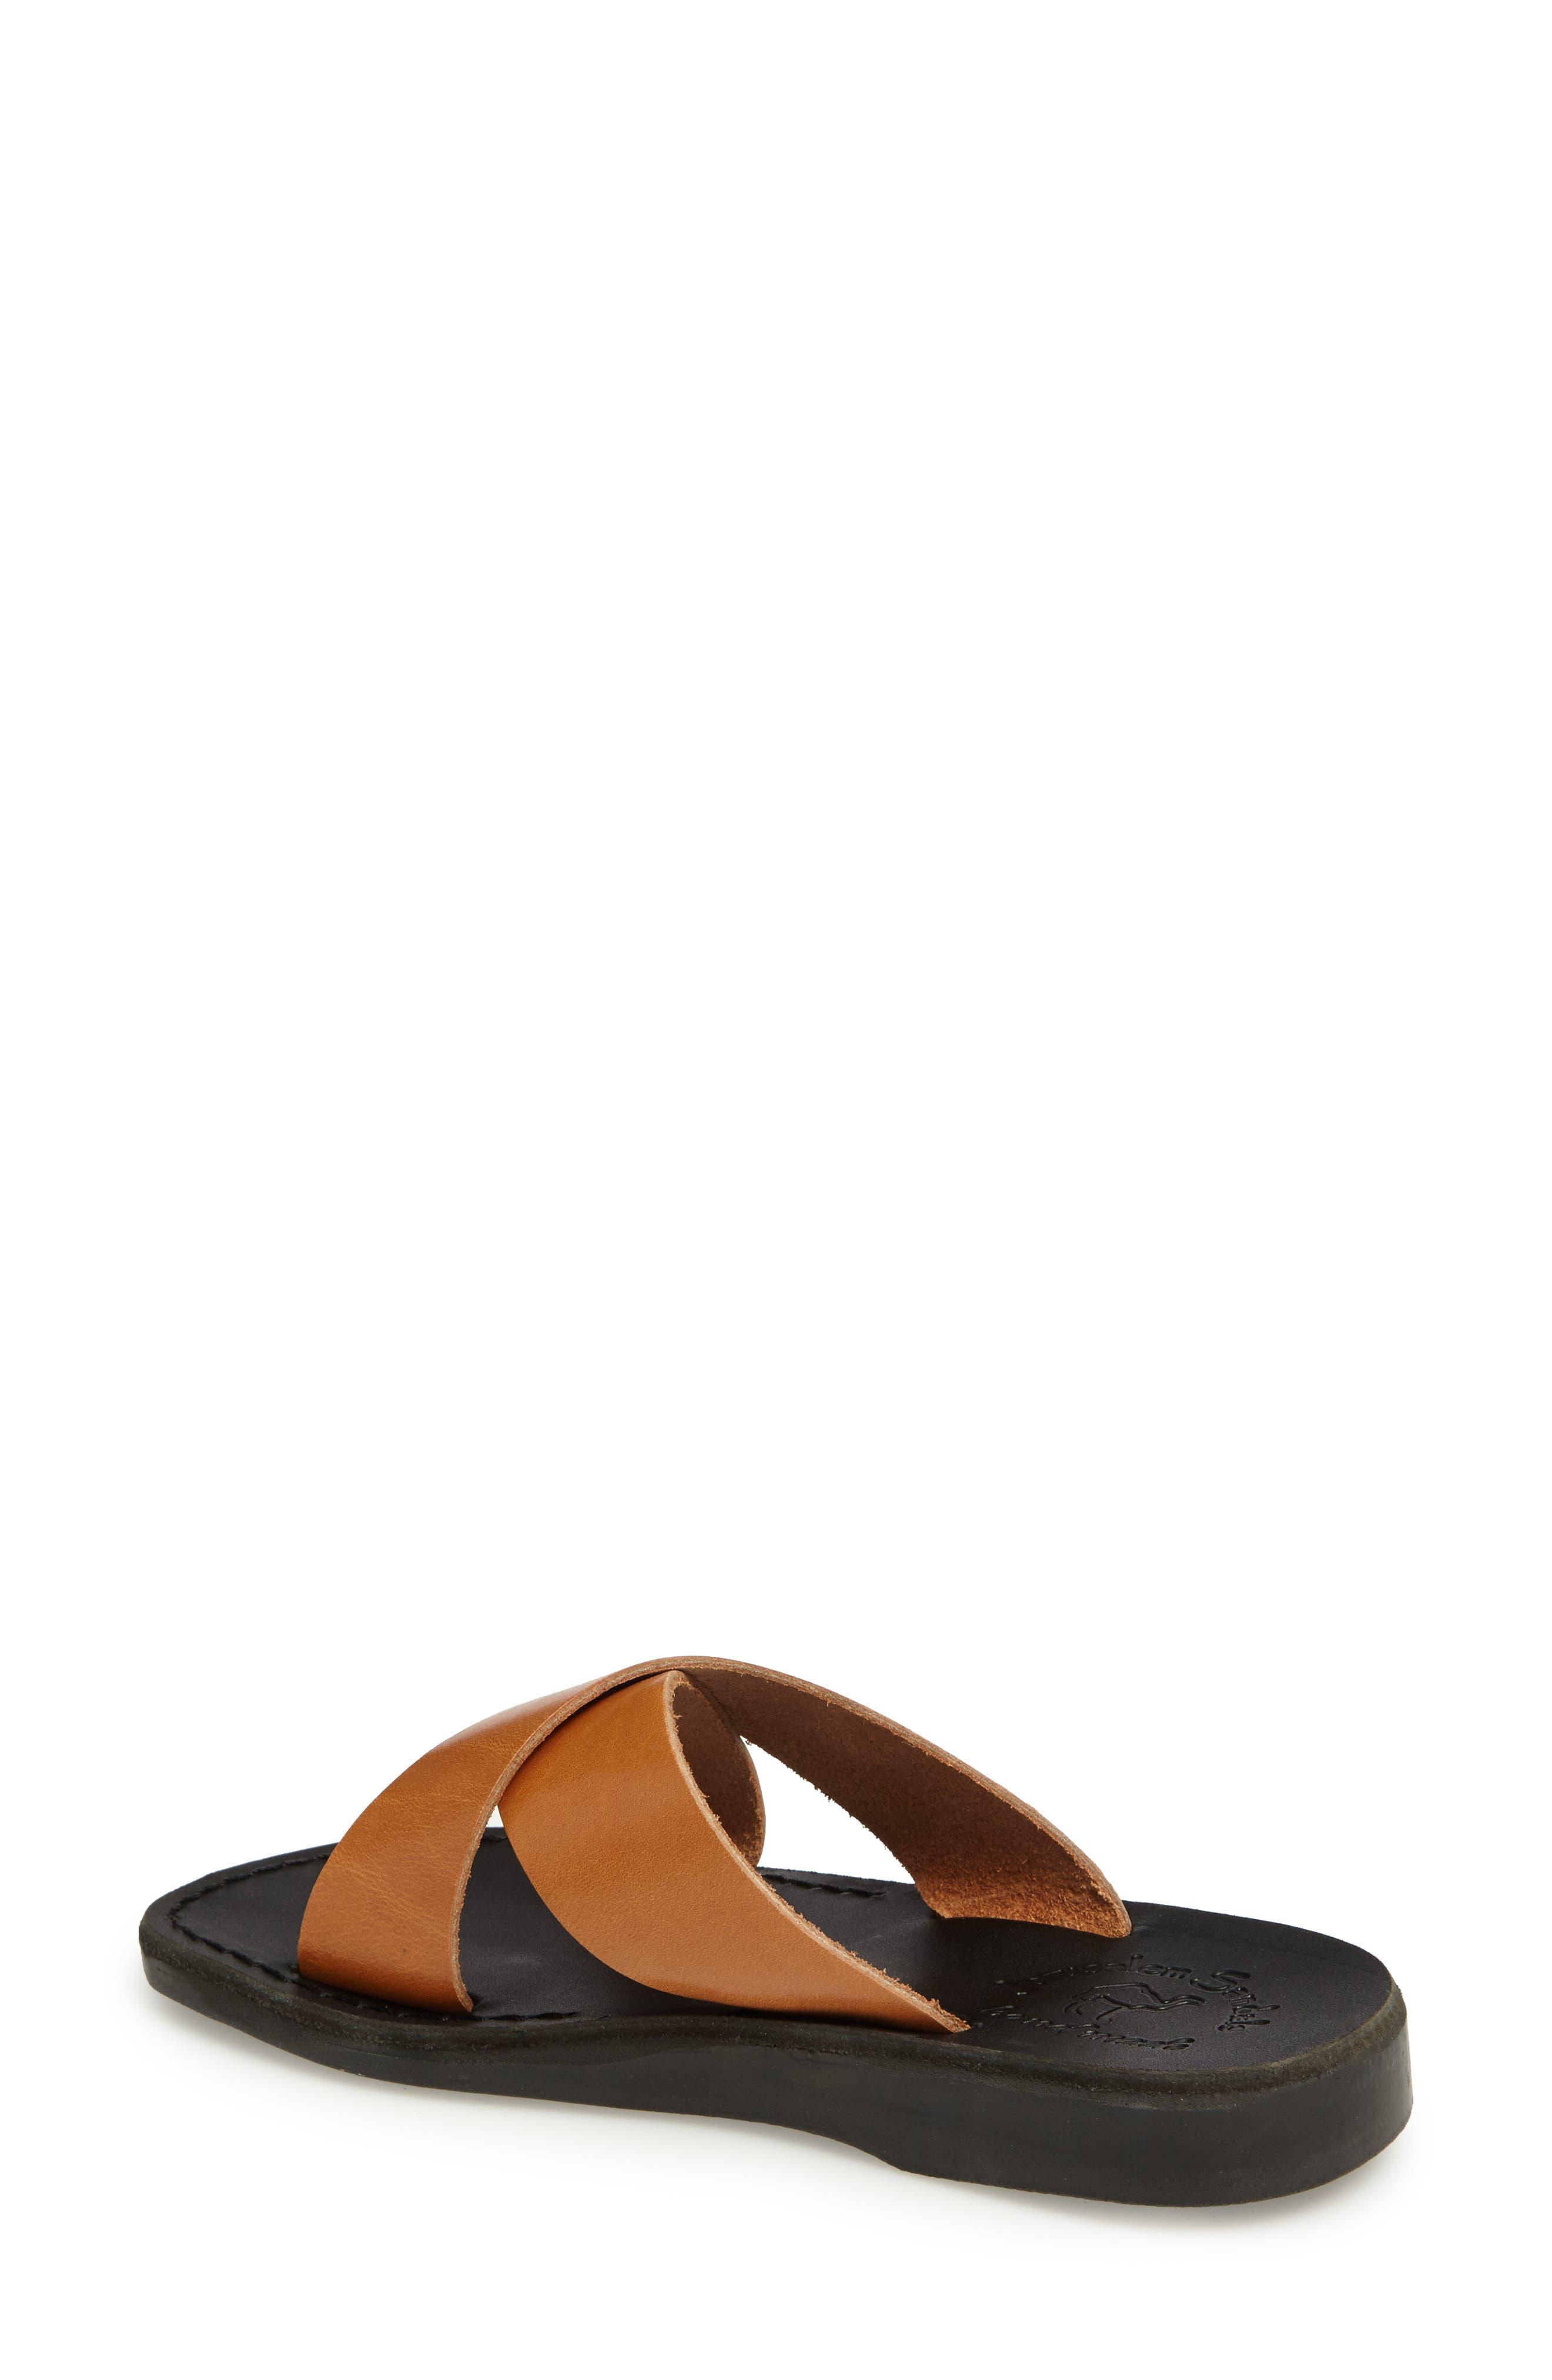 Elan Crisscross Sandal,                             Alternate thumbnail 2, color,                             Brown/ Tan Leather